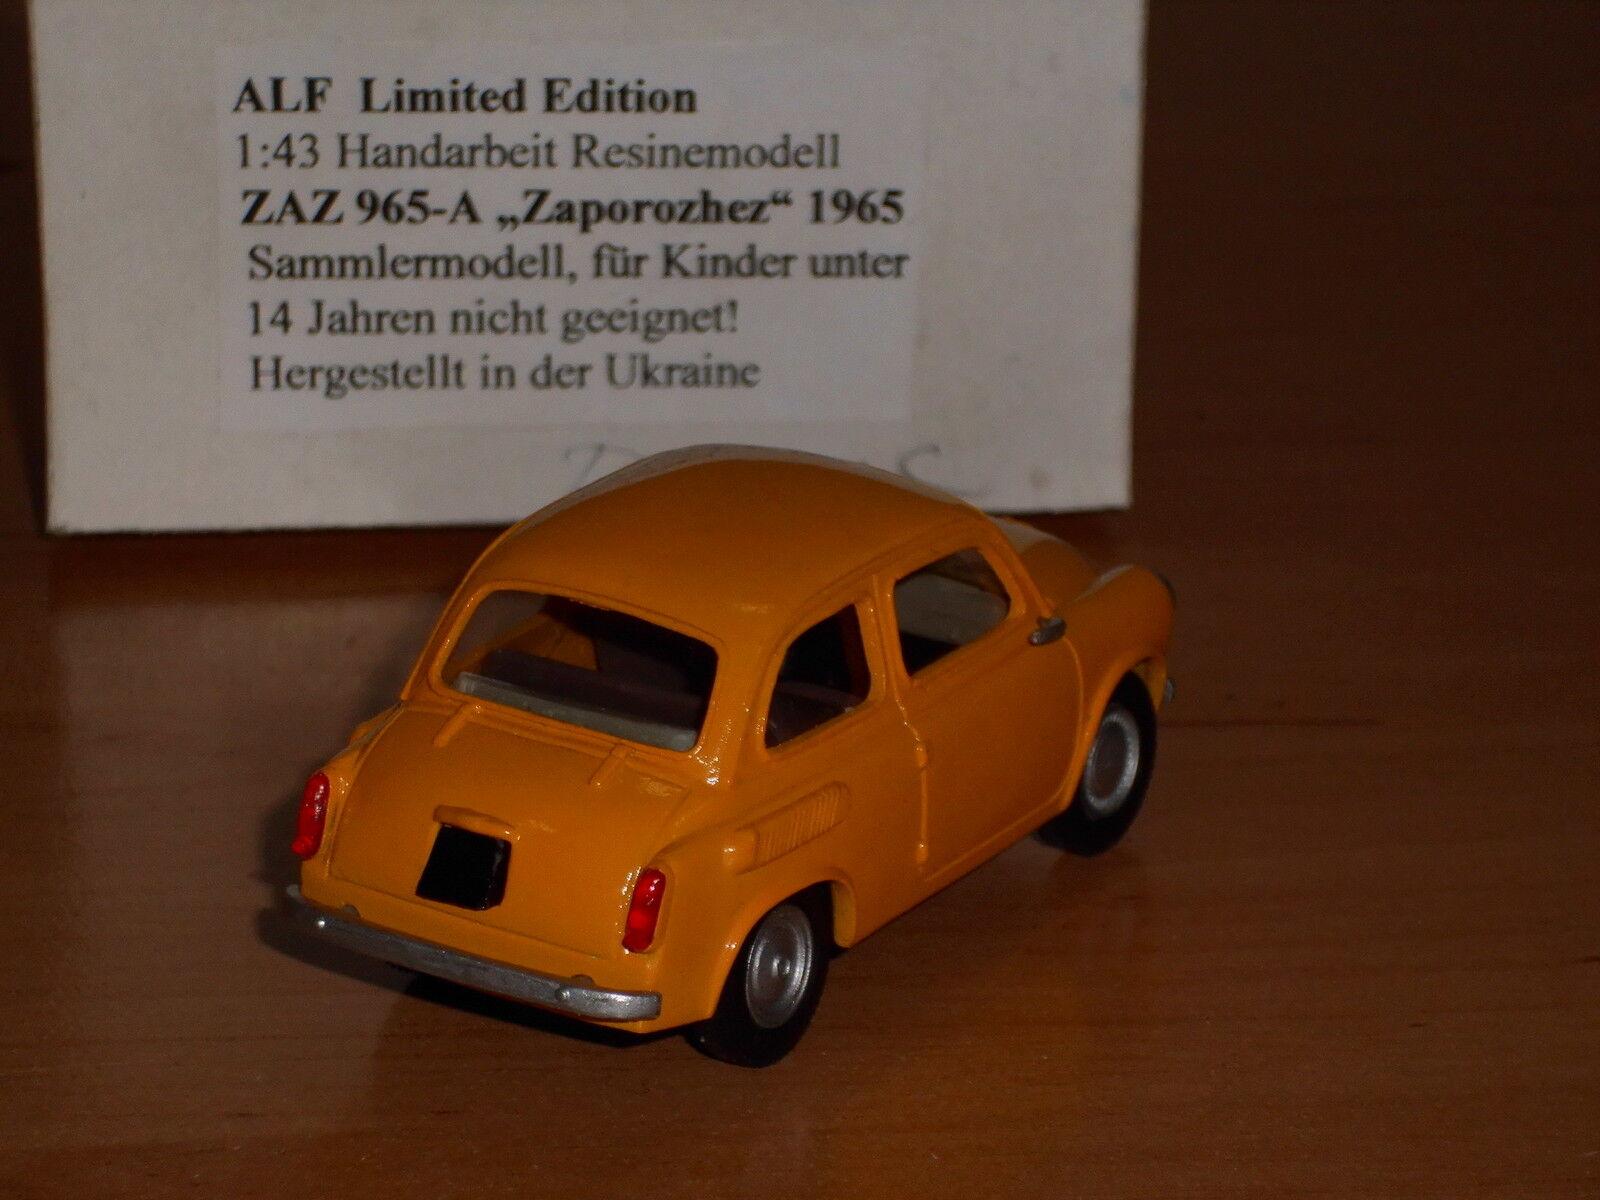 Zaz-965 zaporozhez, zaporozhez, zaporozhez, 1,43, modelo a mano. 1618af